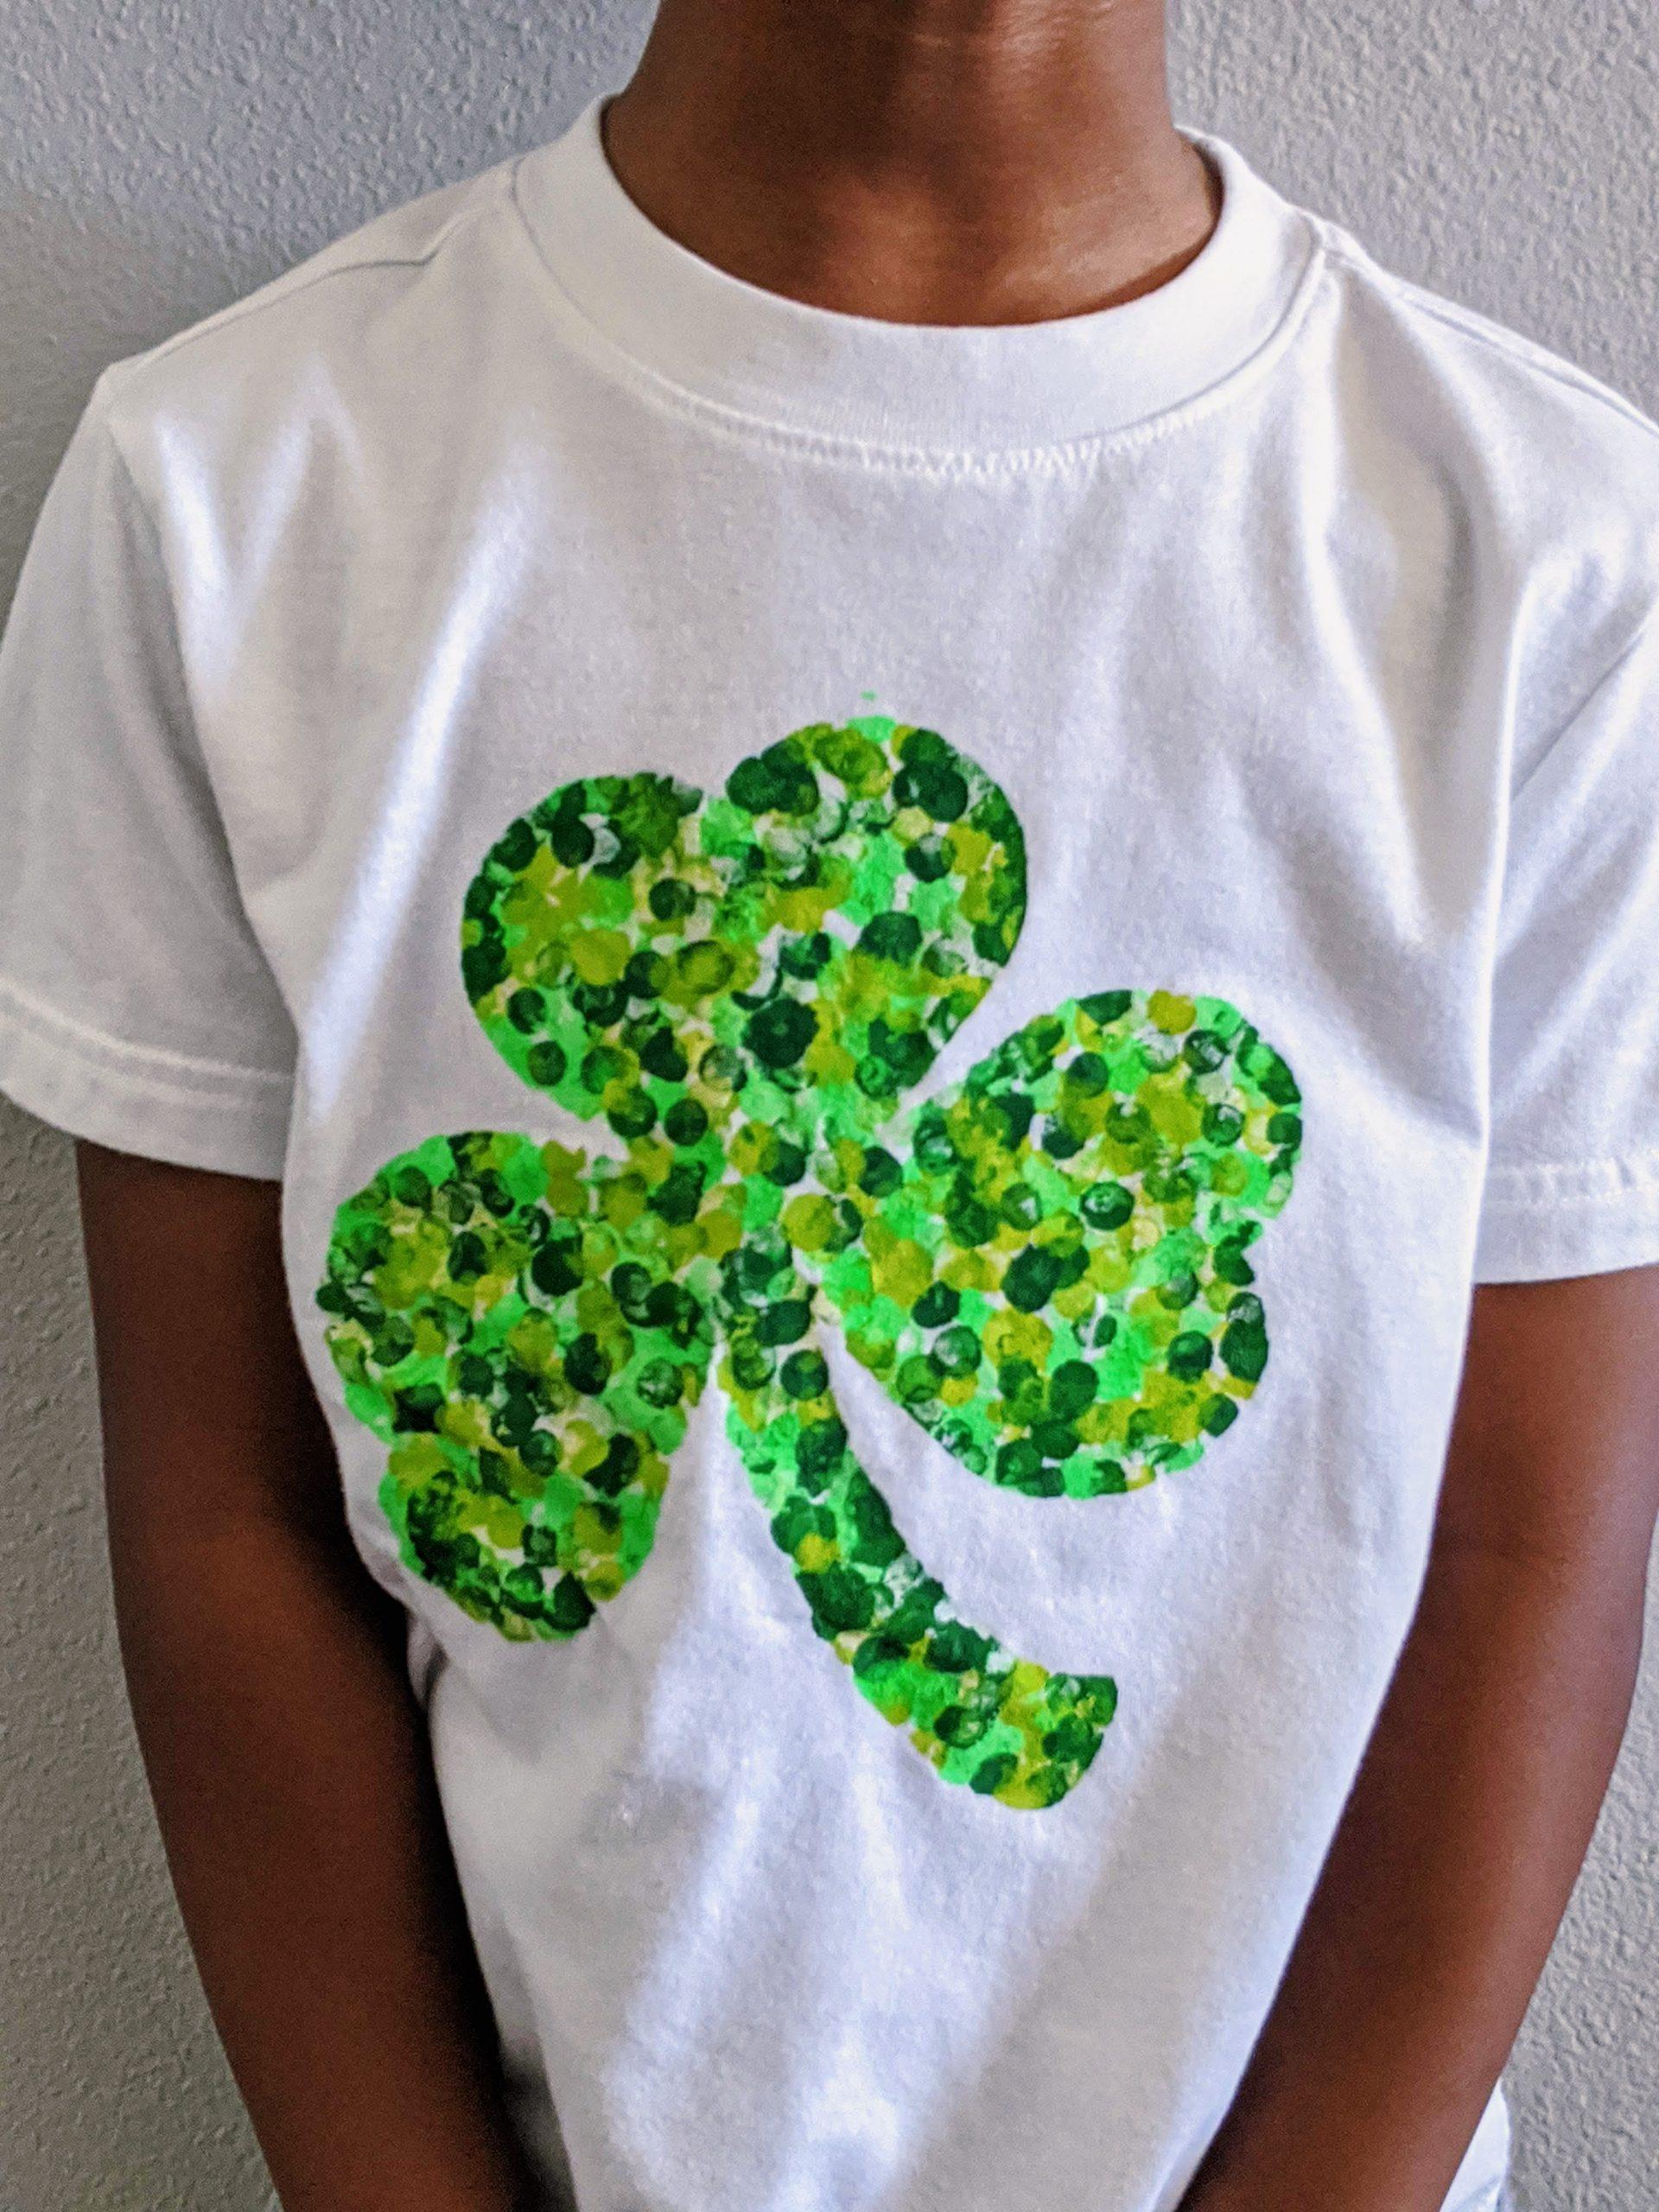 DIY shamrock shirt for St. Patrick's Day